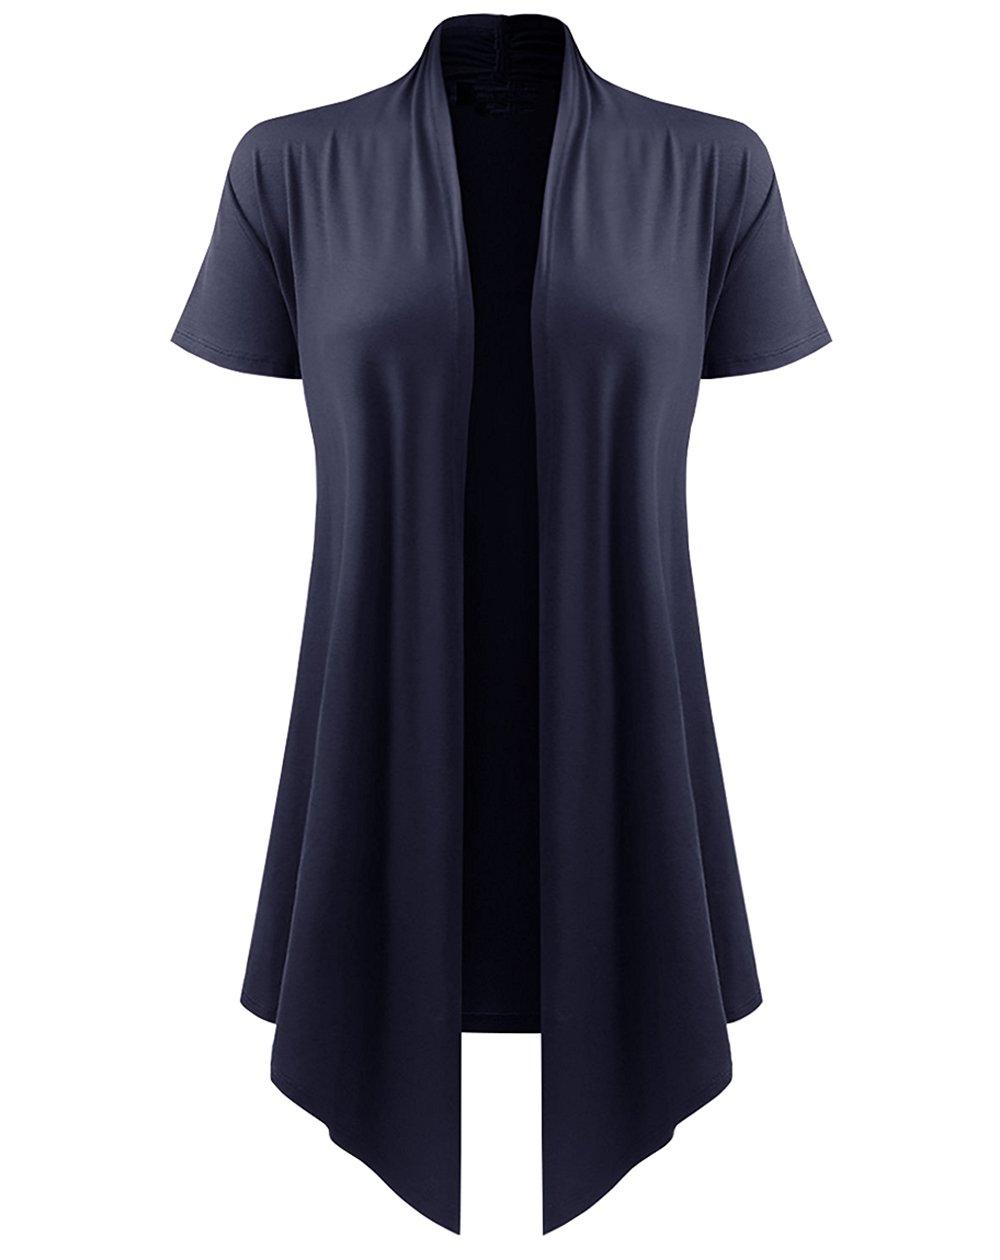 Dutebare Womens Short Sleeve Open Front Cardigan Drape Hem Lightweight Cardigans Navy Blue 2XL